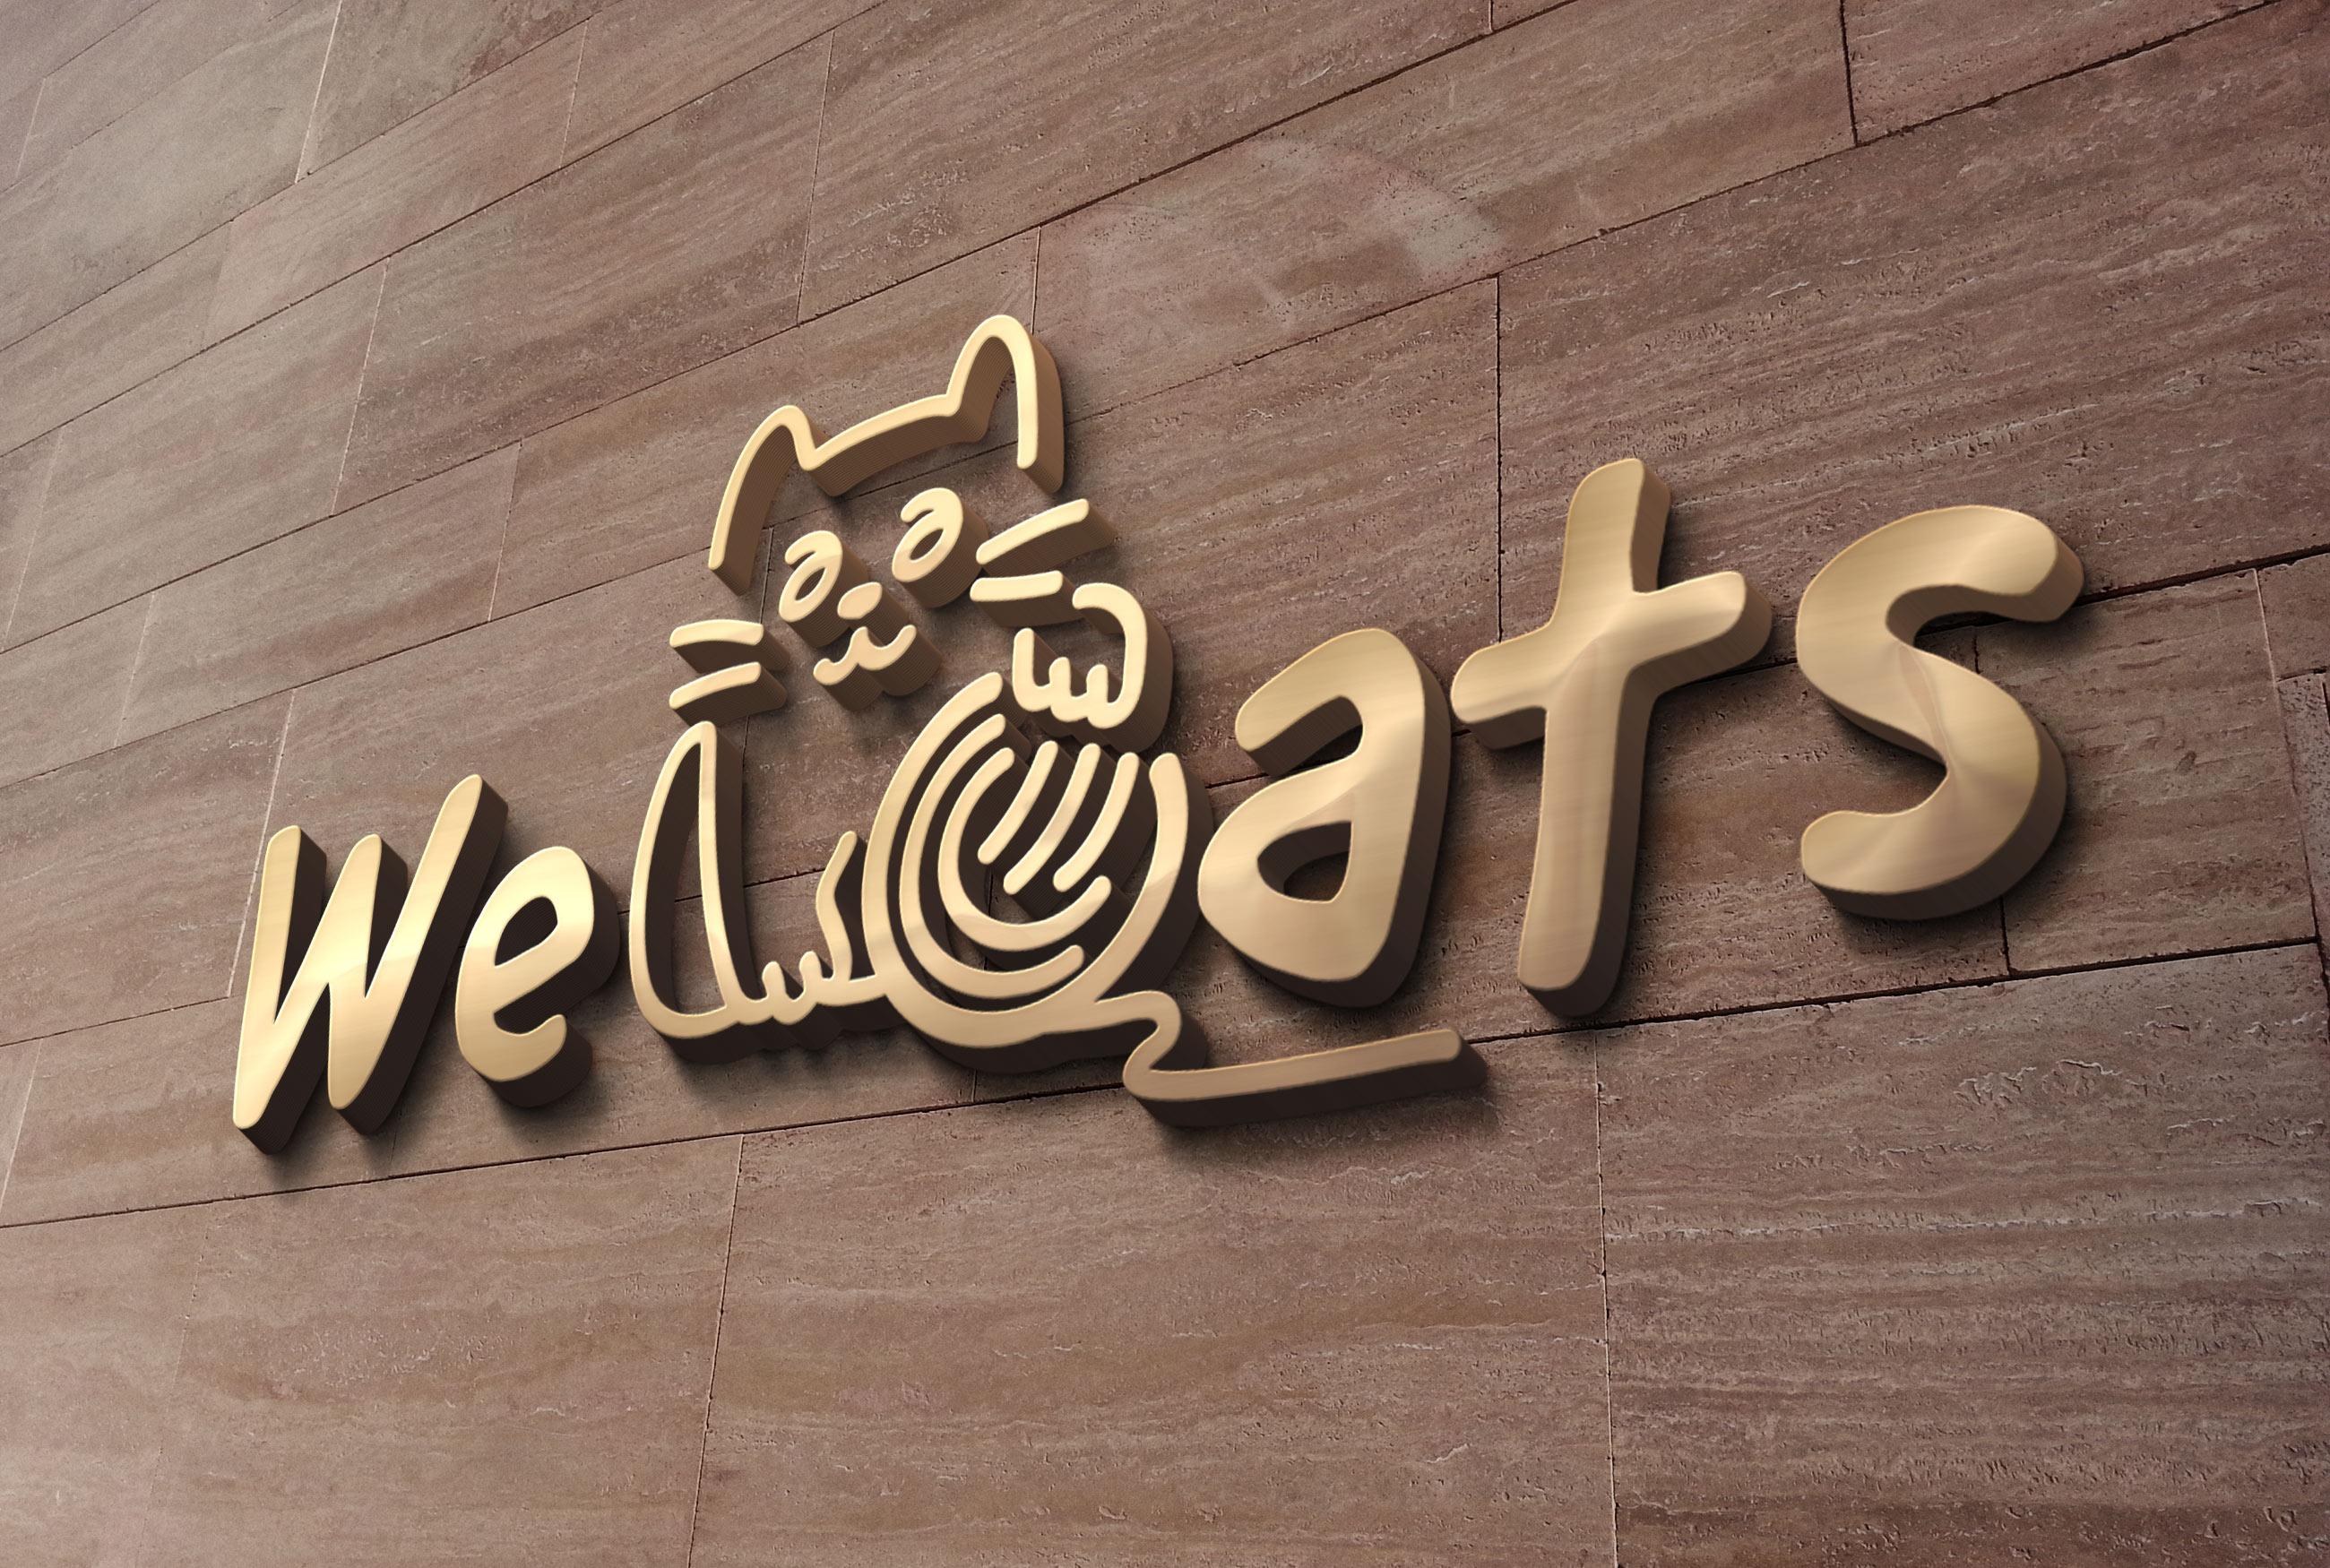 Создание логотипа WeCats фото f_1105f1b3e83d510b.jpg